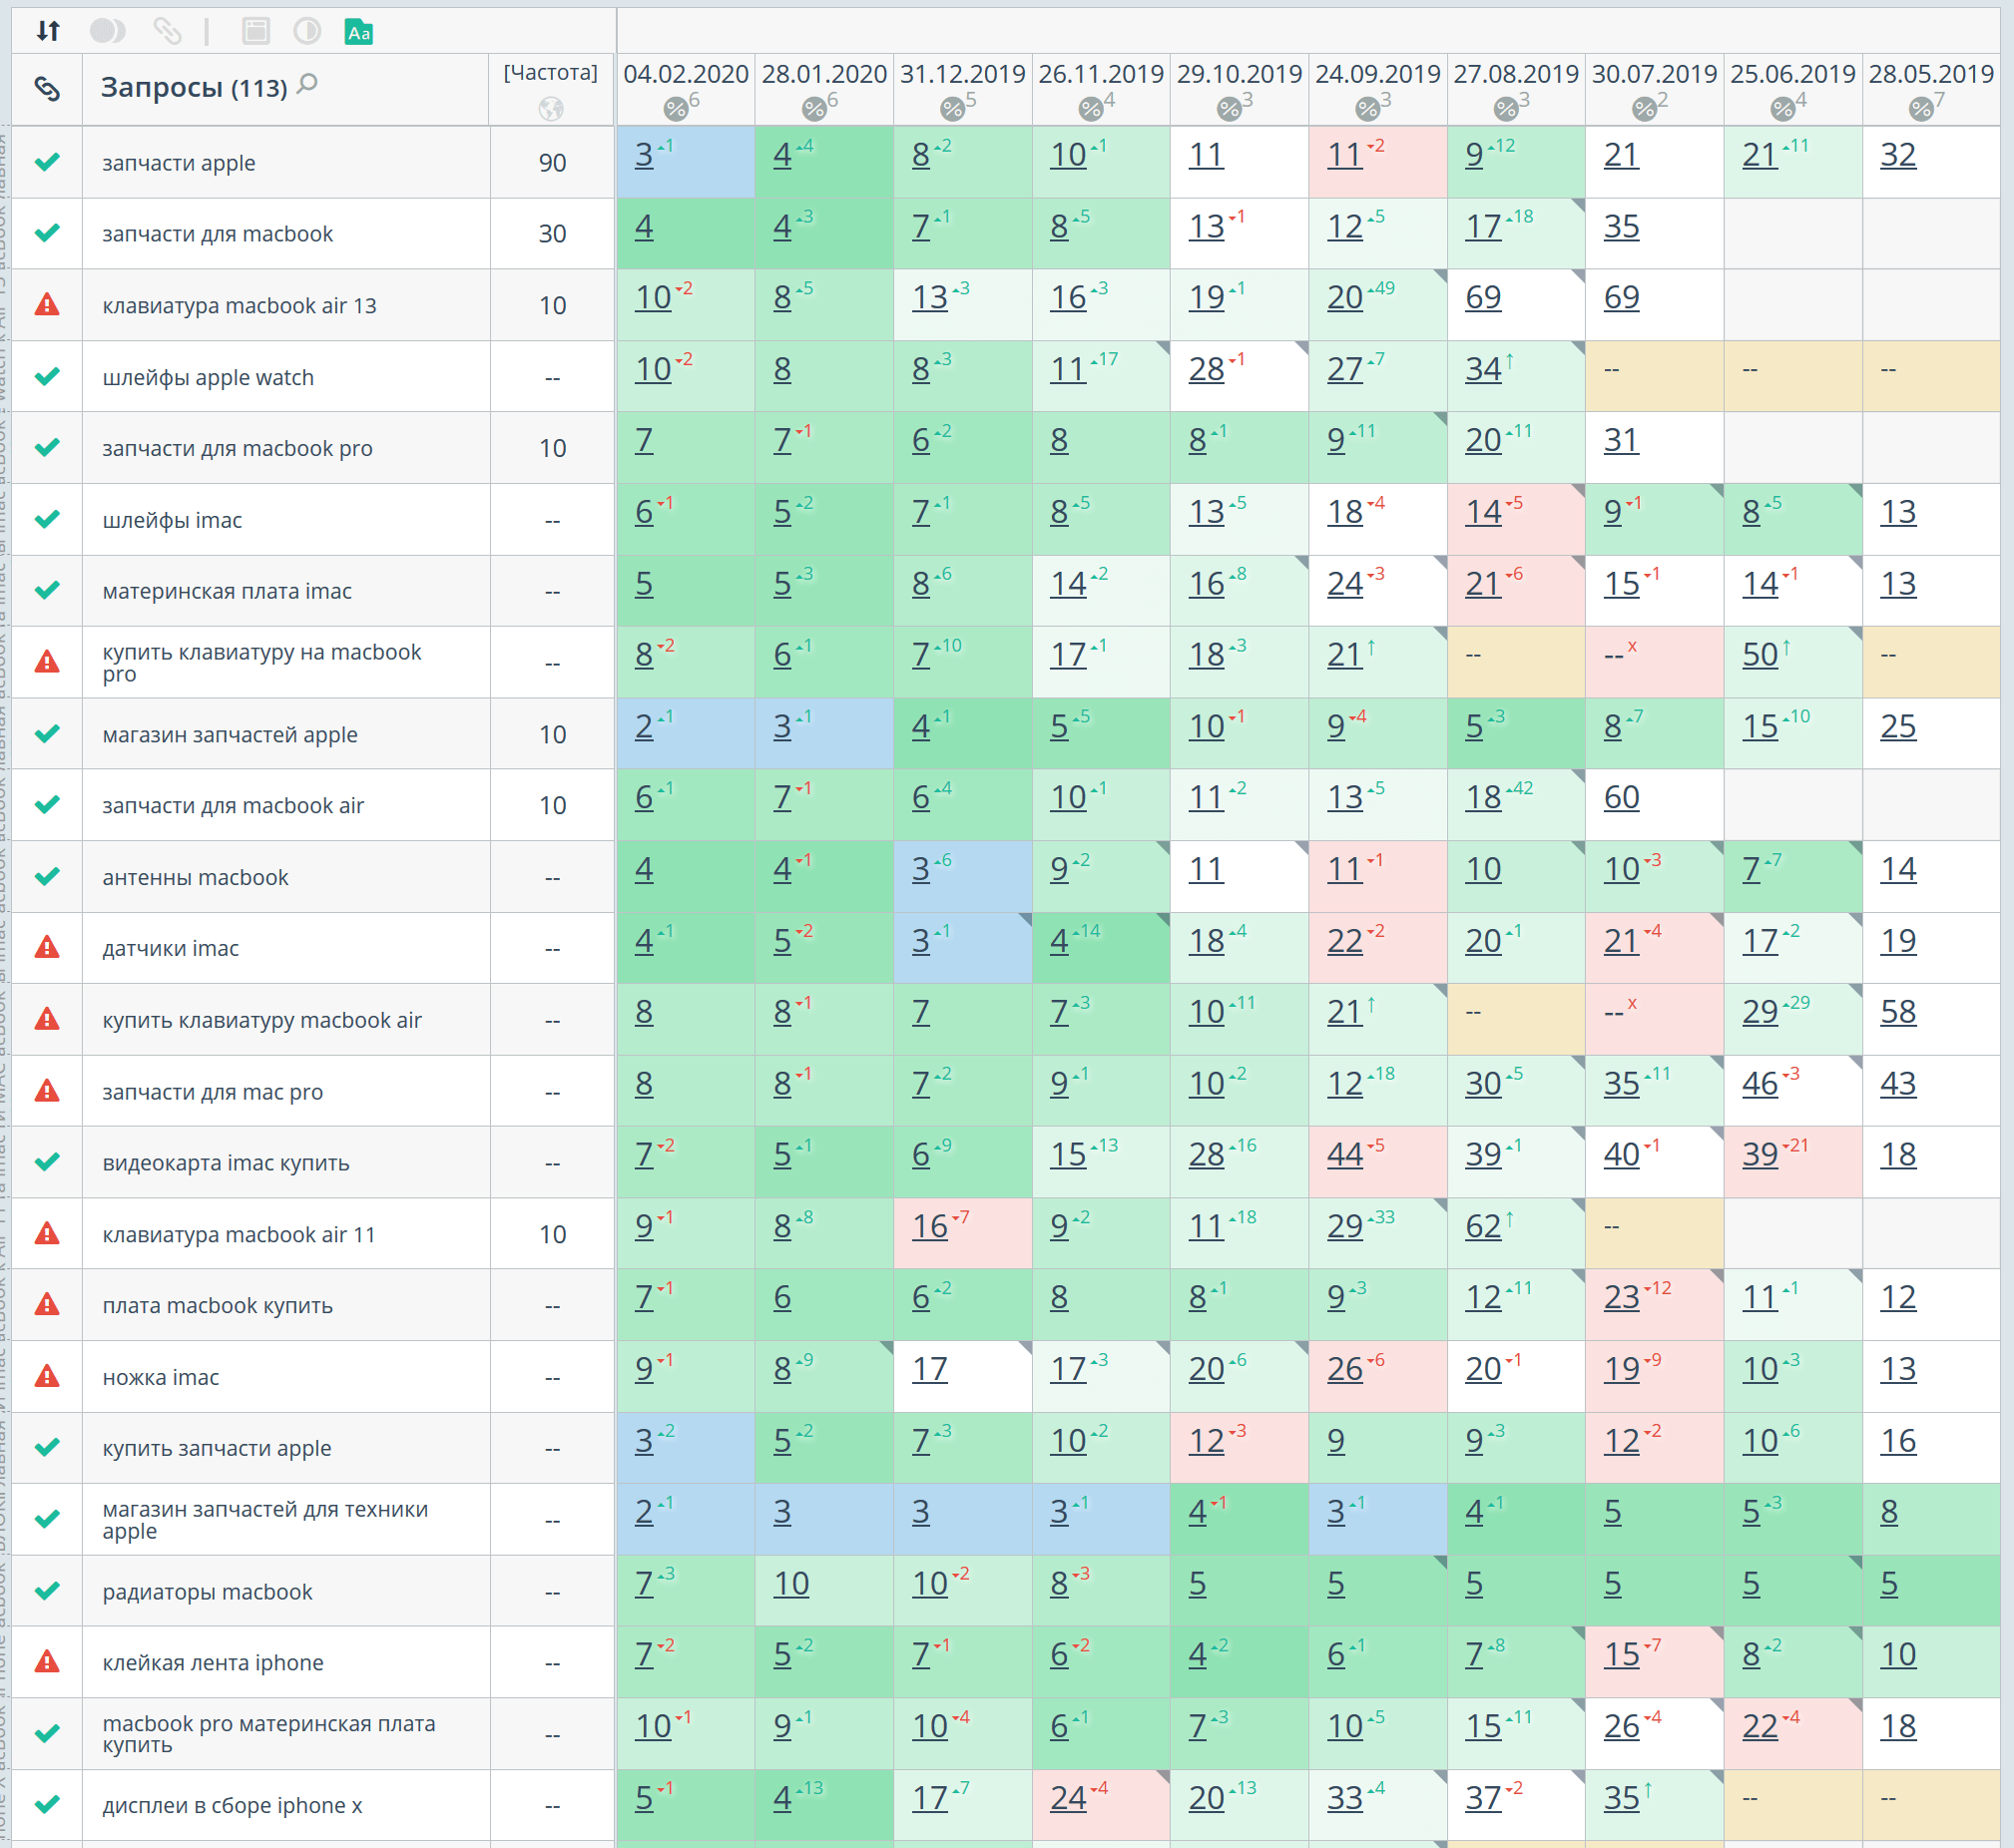 Статистика позиций по Google, регион Москва